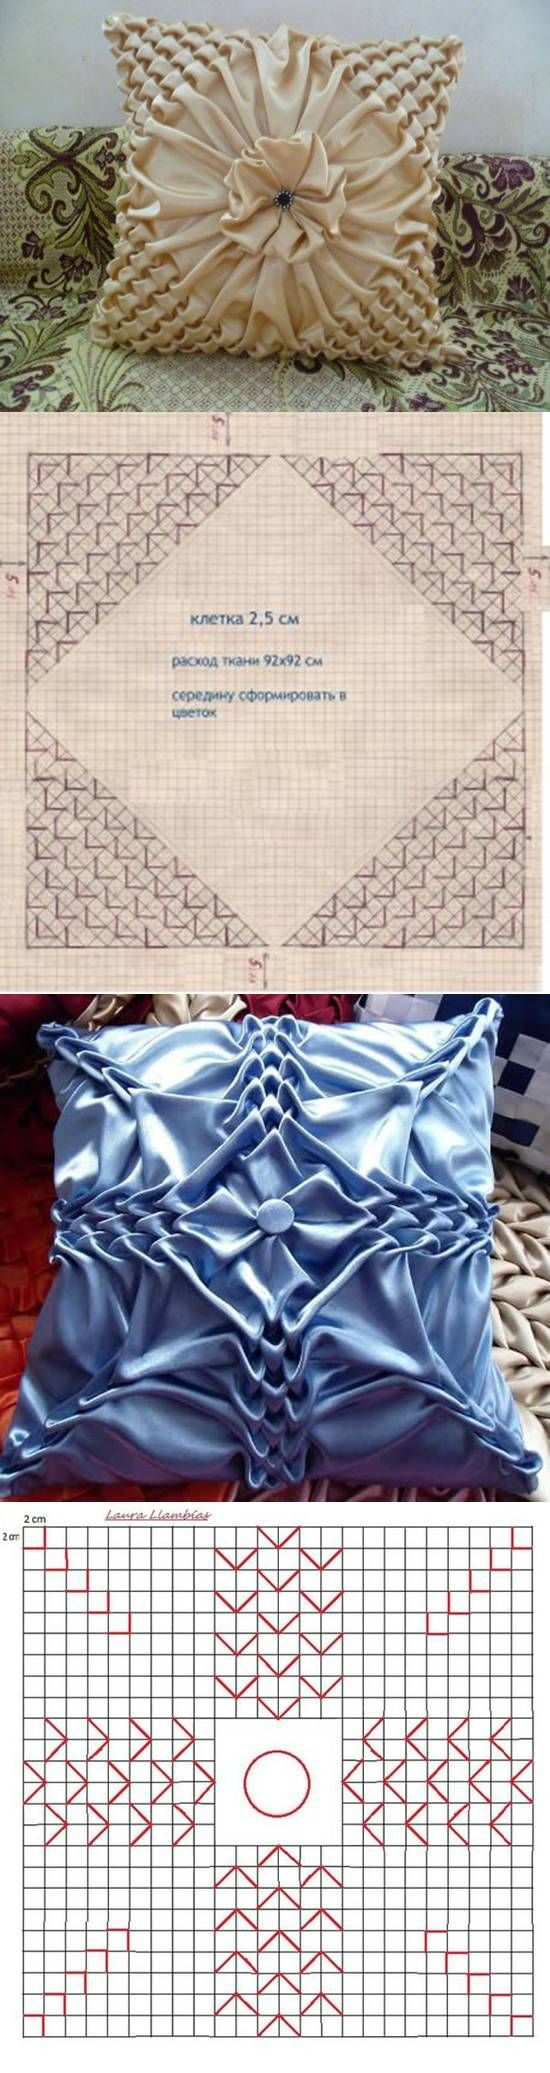 DIY Pillow Patterns Puffed Sleeves DIY Pillow Patterns Puffed Sleeves